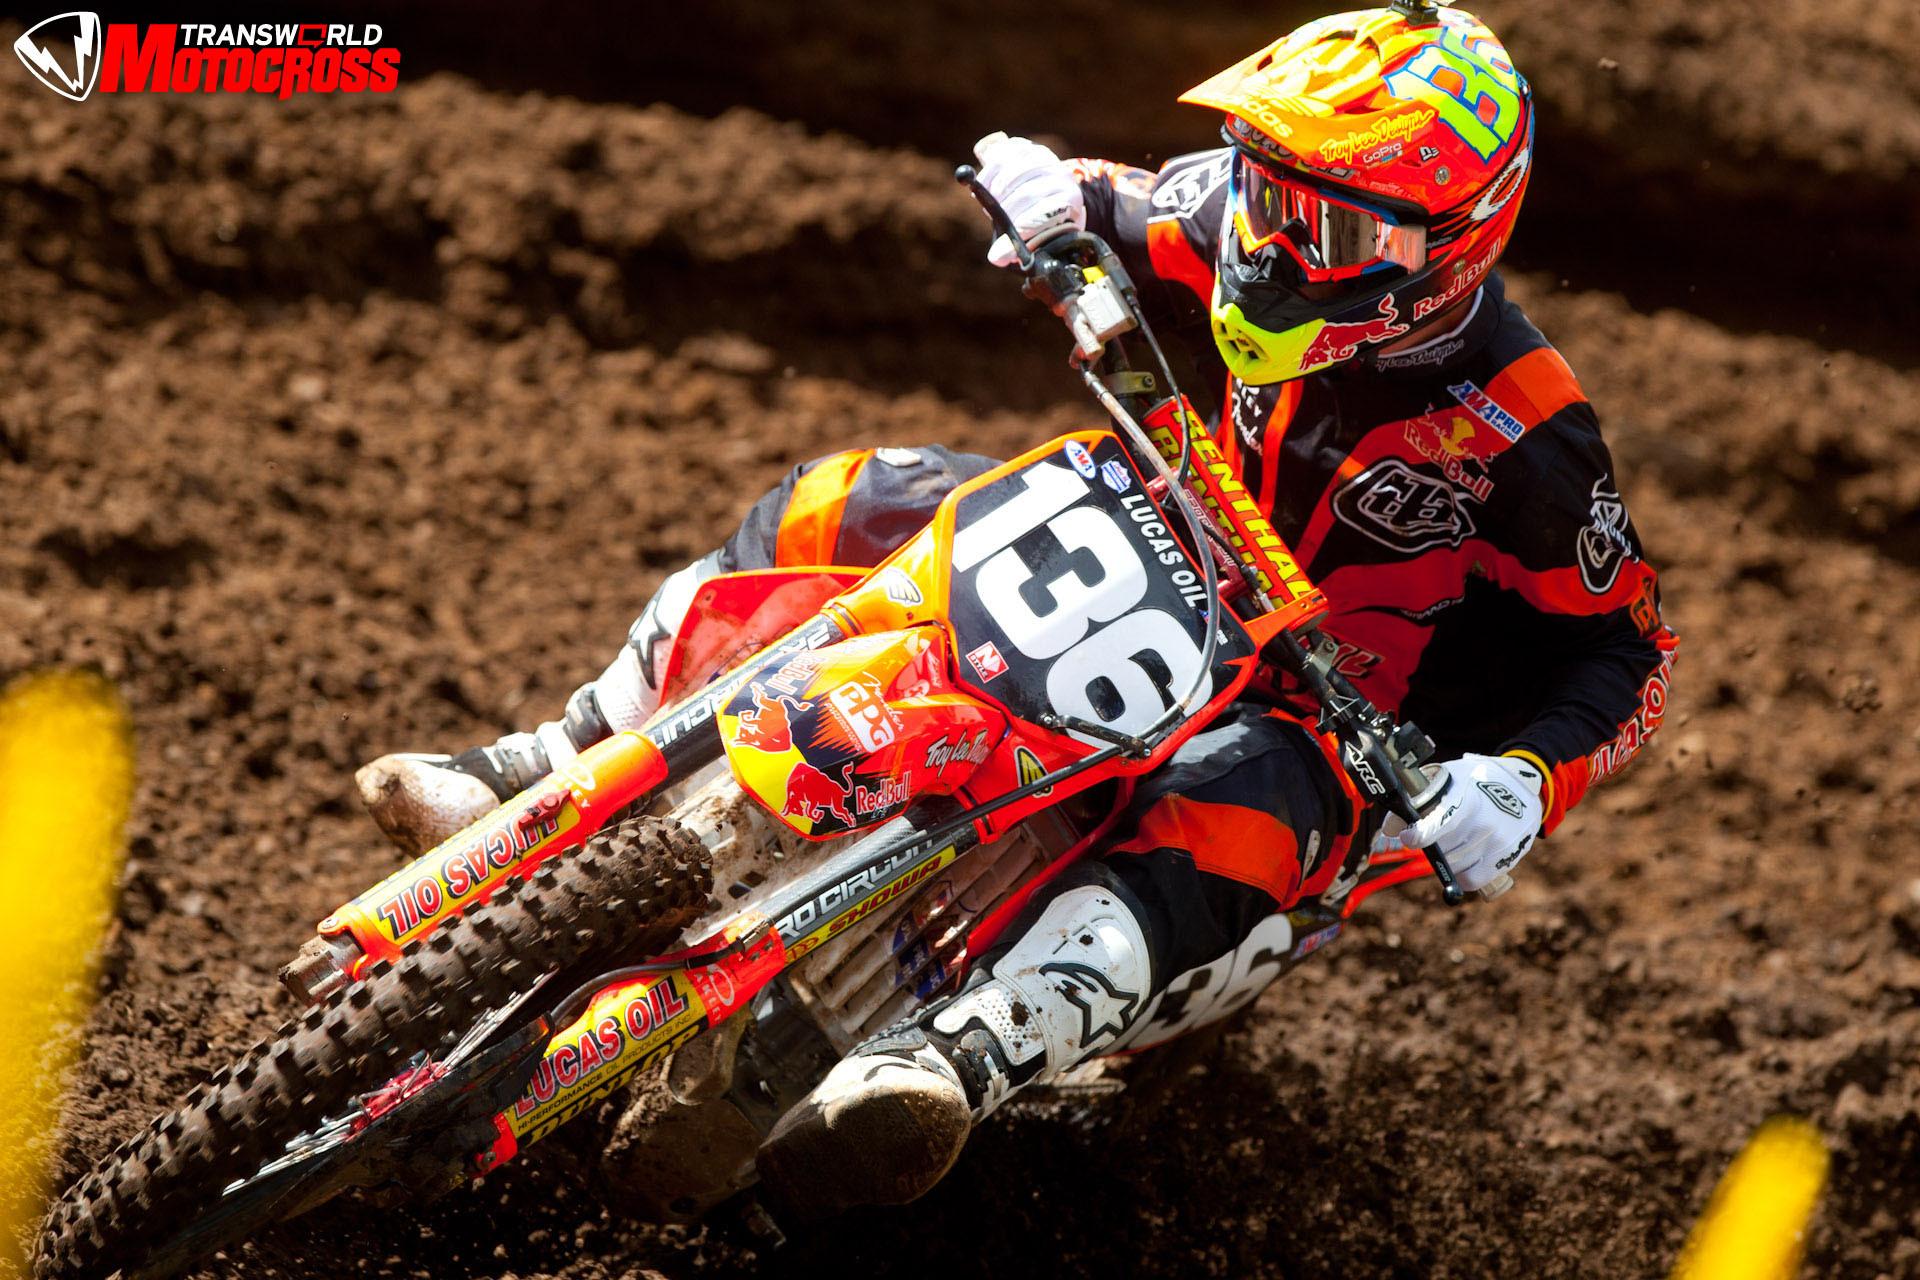 High Quality Motocross HD Wallpaper Full HD Pictures 1920×1080 Motocross  Wallpapers (39 Wallpapers